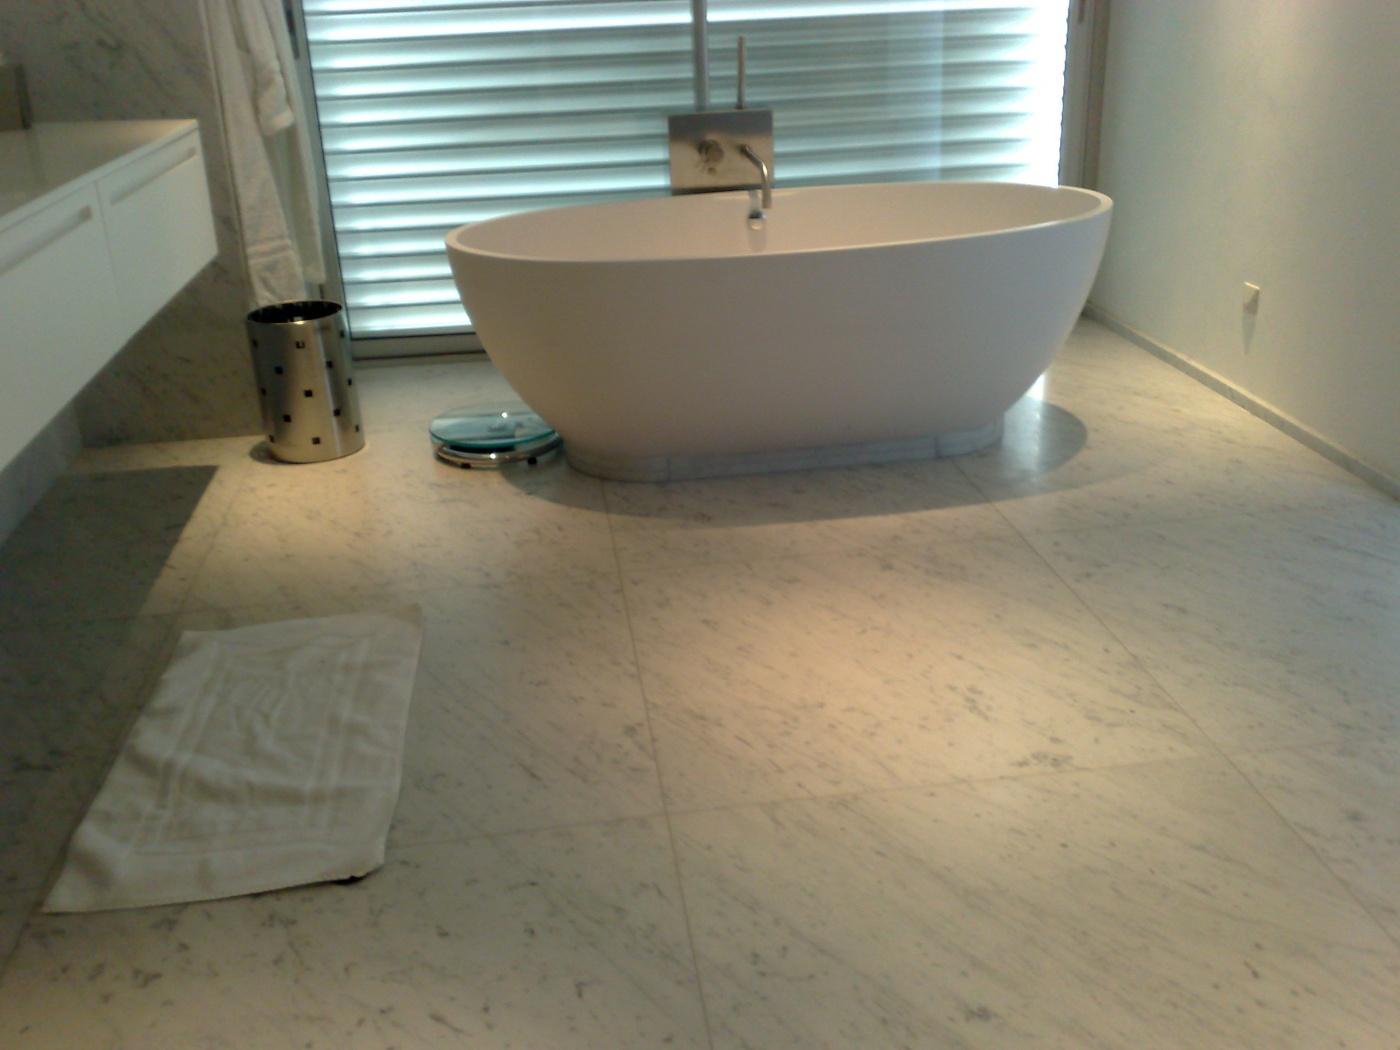 Ardun Sols de salle de bains en Blanc Carrare C adouci avec baignoire design Boffi